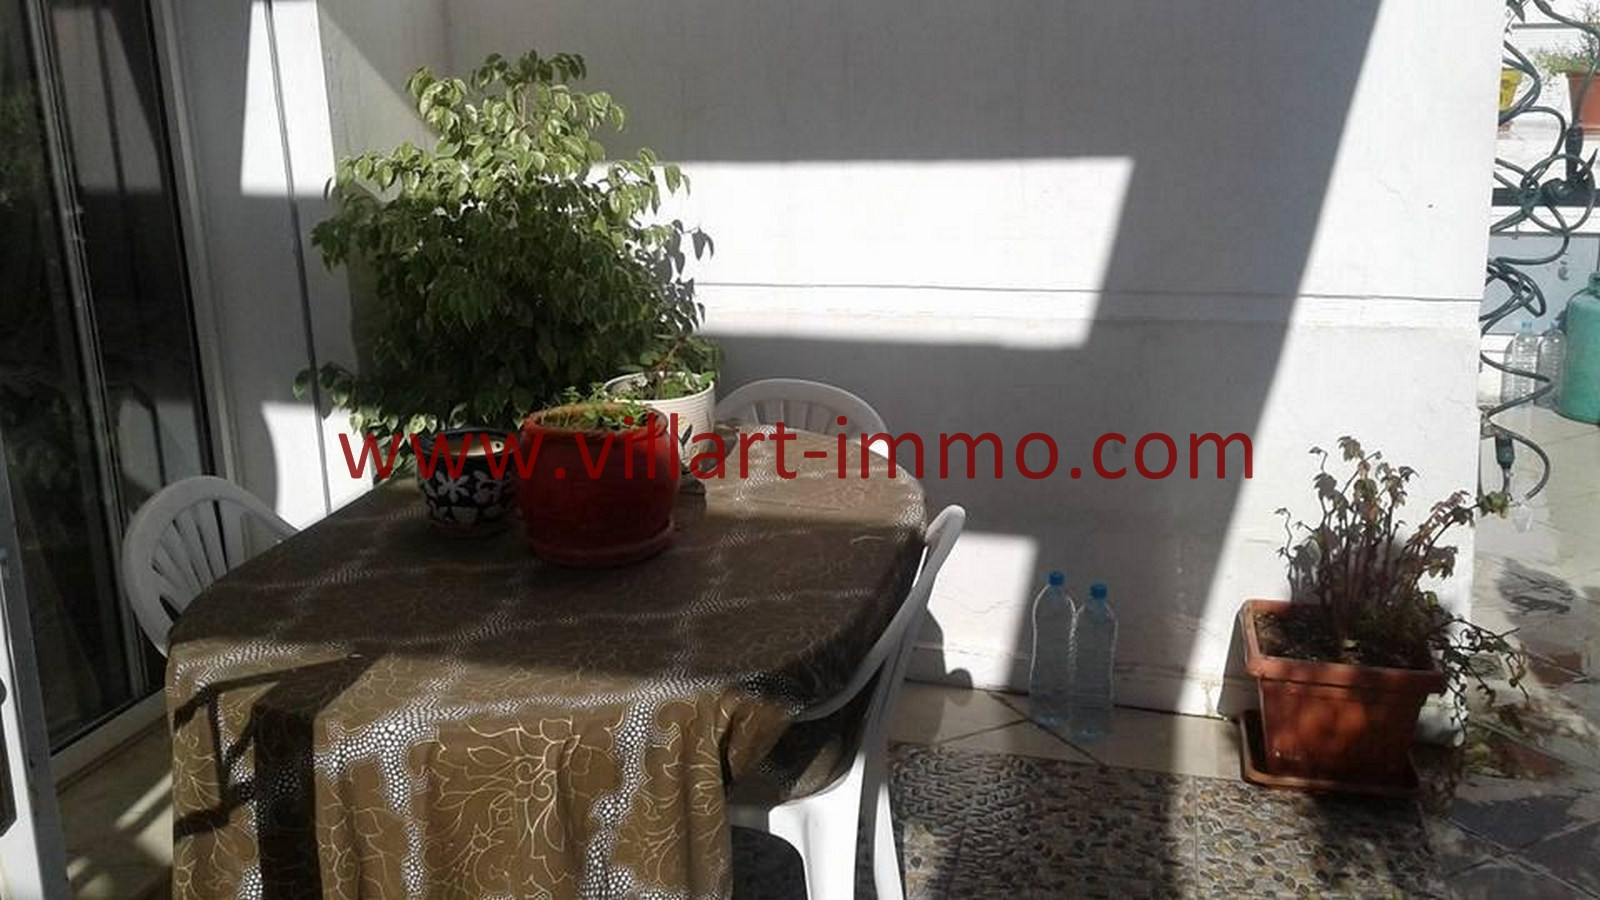 3-Vente-Appartement-Tanger-Route-de-Rabat-Terrasse 1 -VA476-Villart Immo